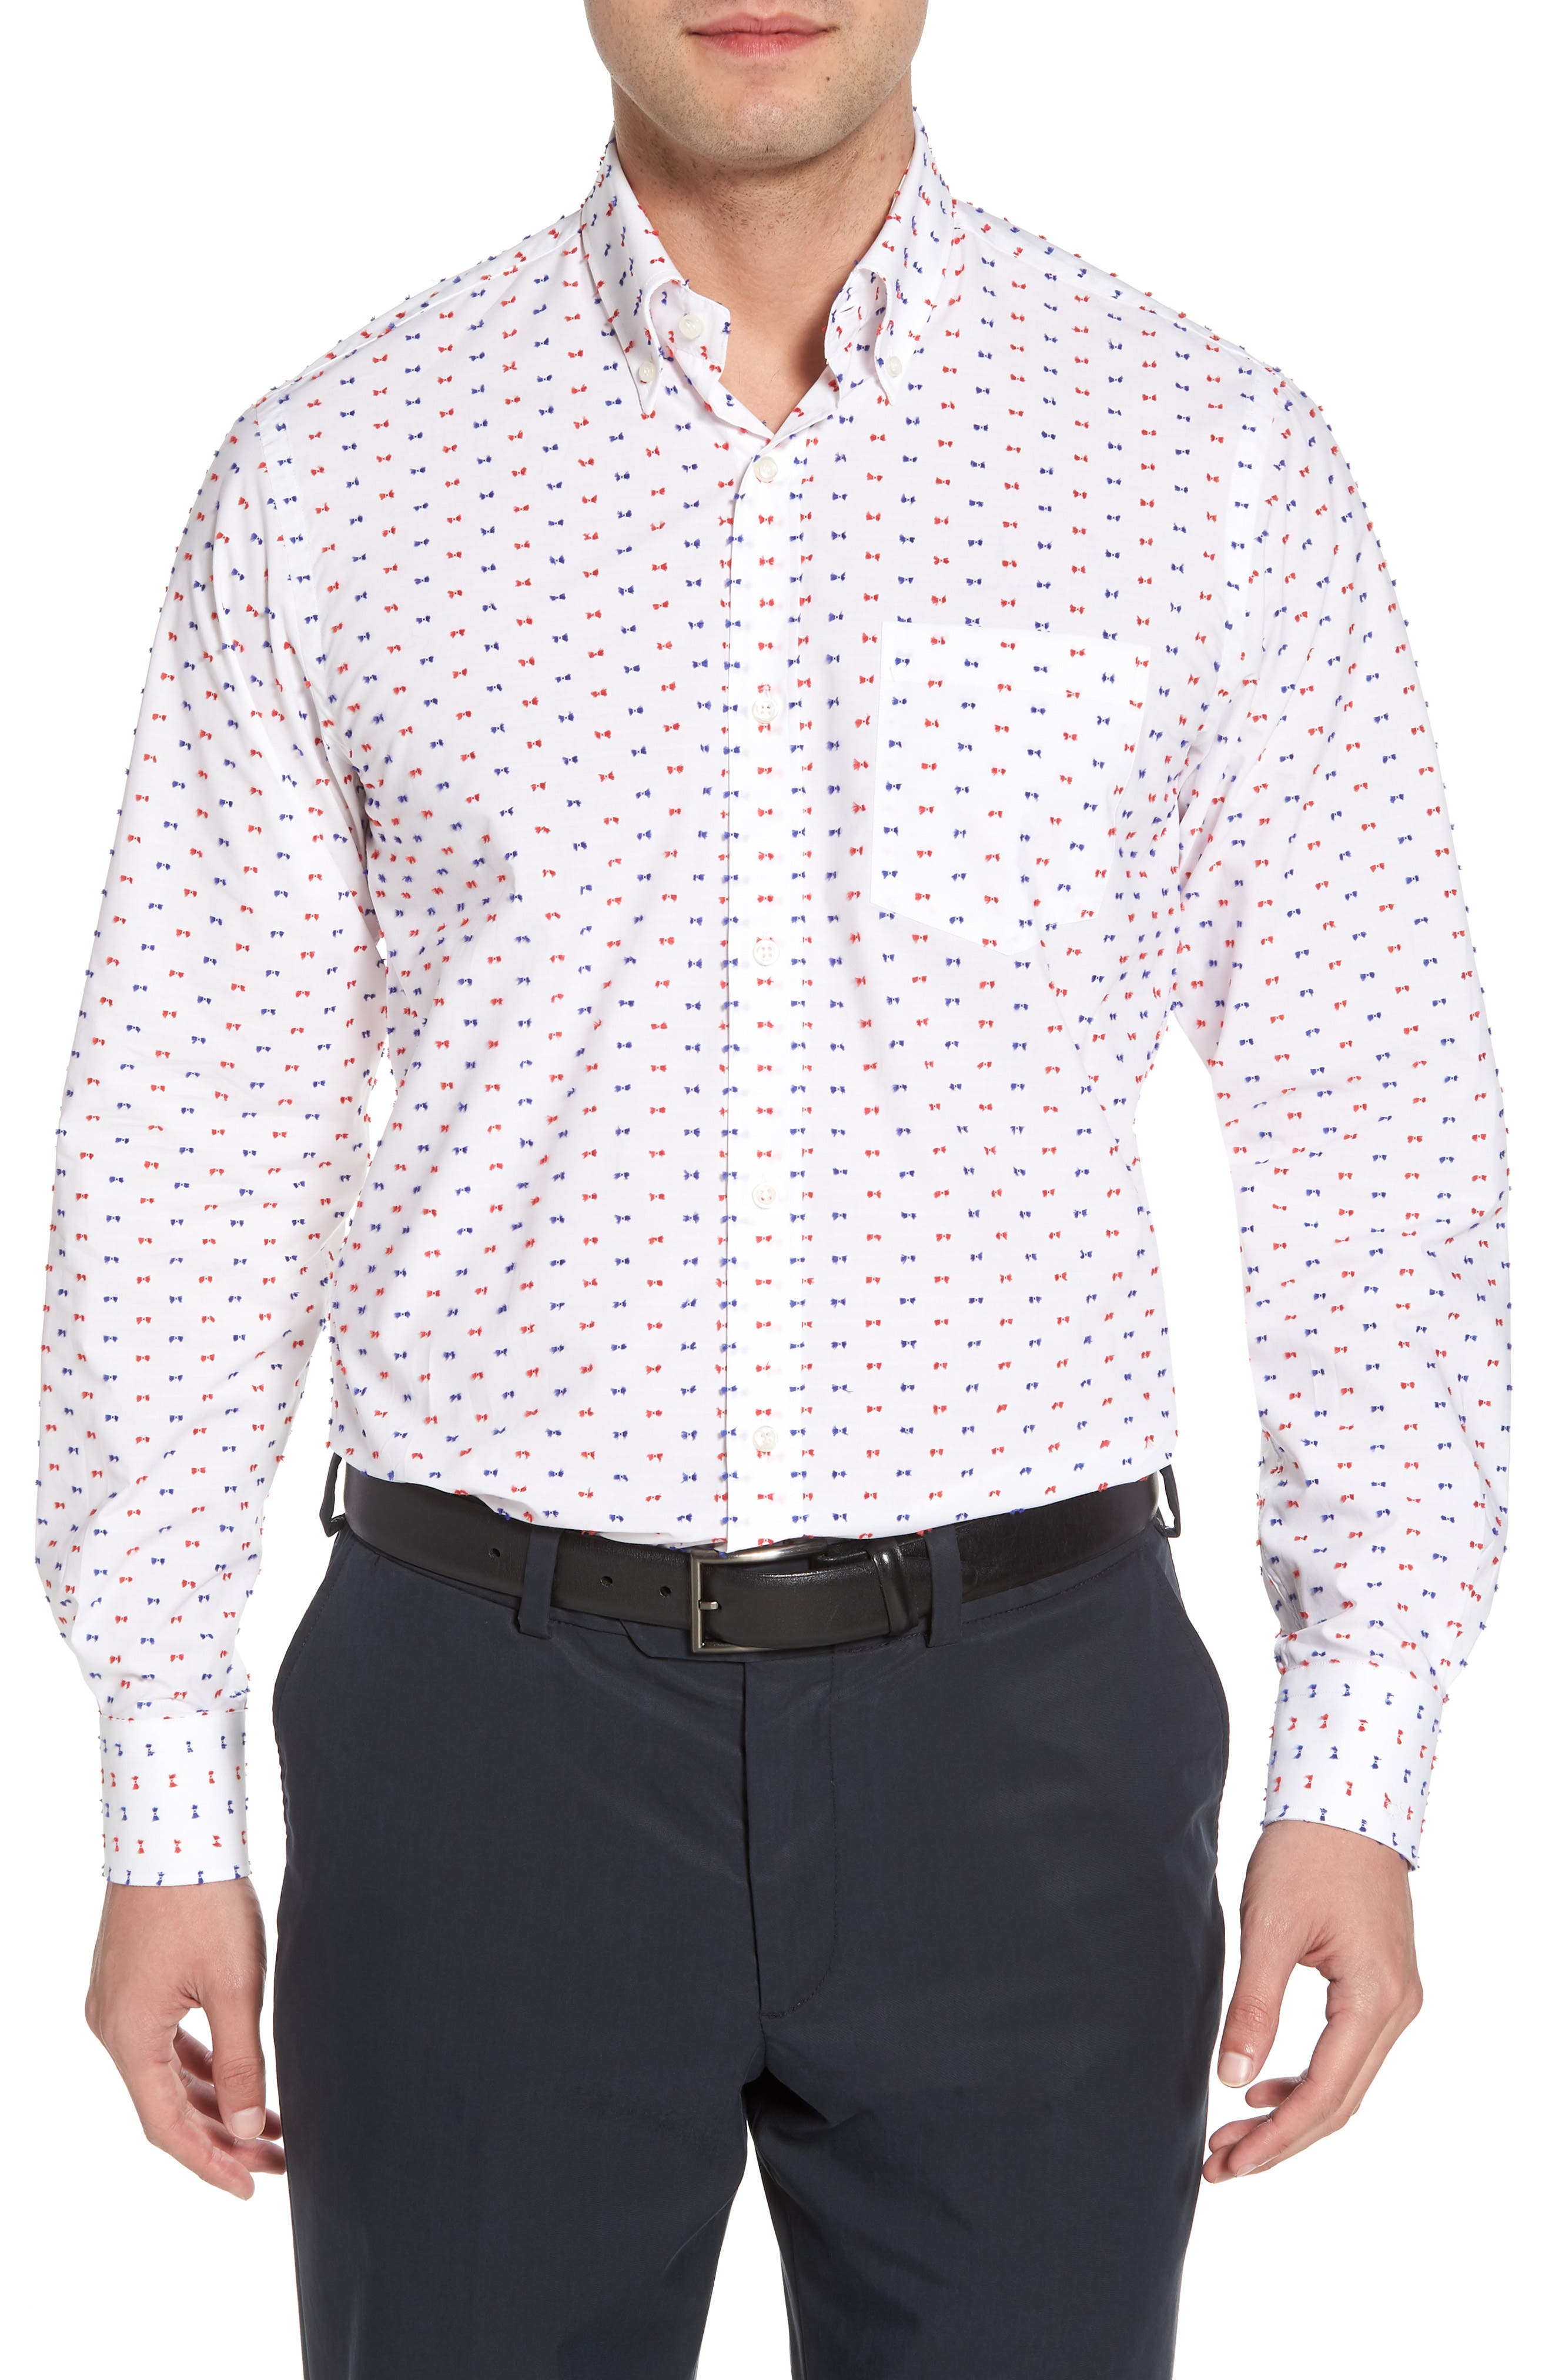 Paul&Shark Regular Fit Feathered Sport Shirt,                         Main,                         color, White